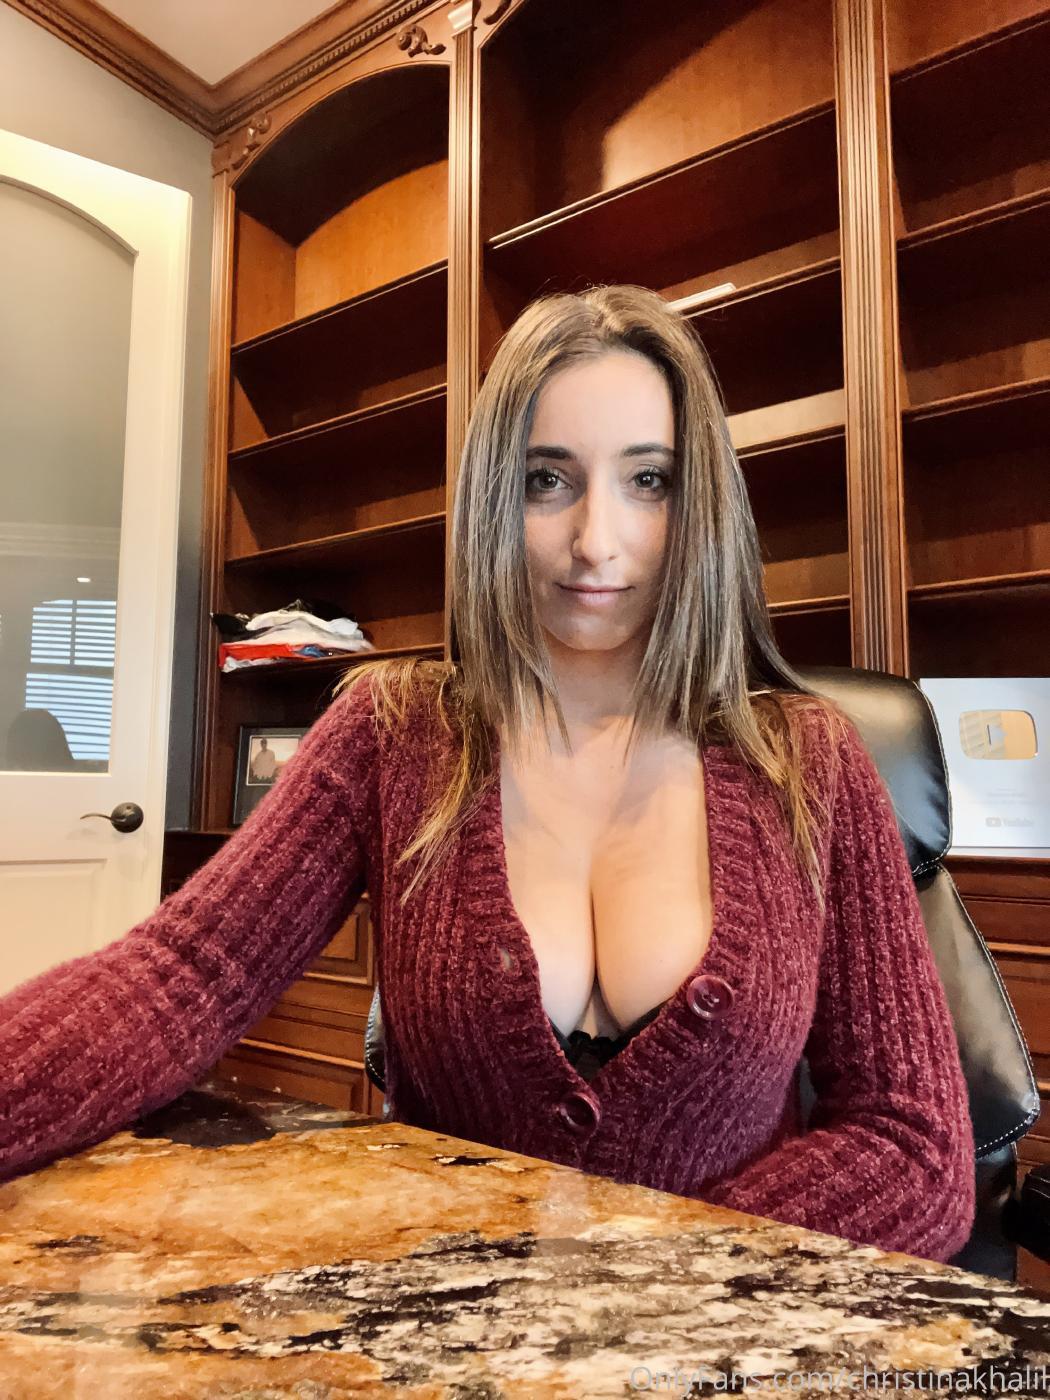 Christina Khalil Office Secretary Roleplay Onlyfans Leaked 7